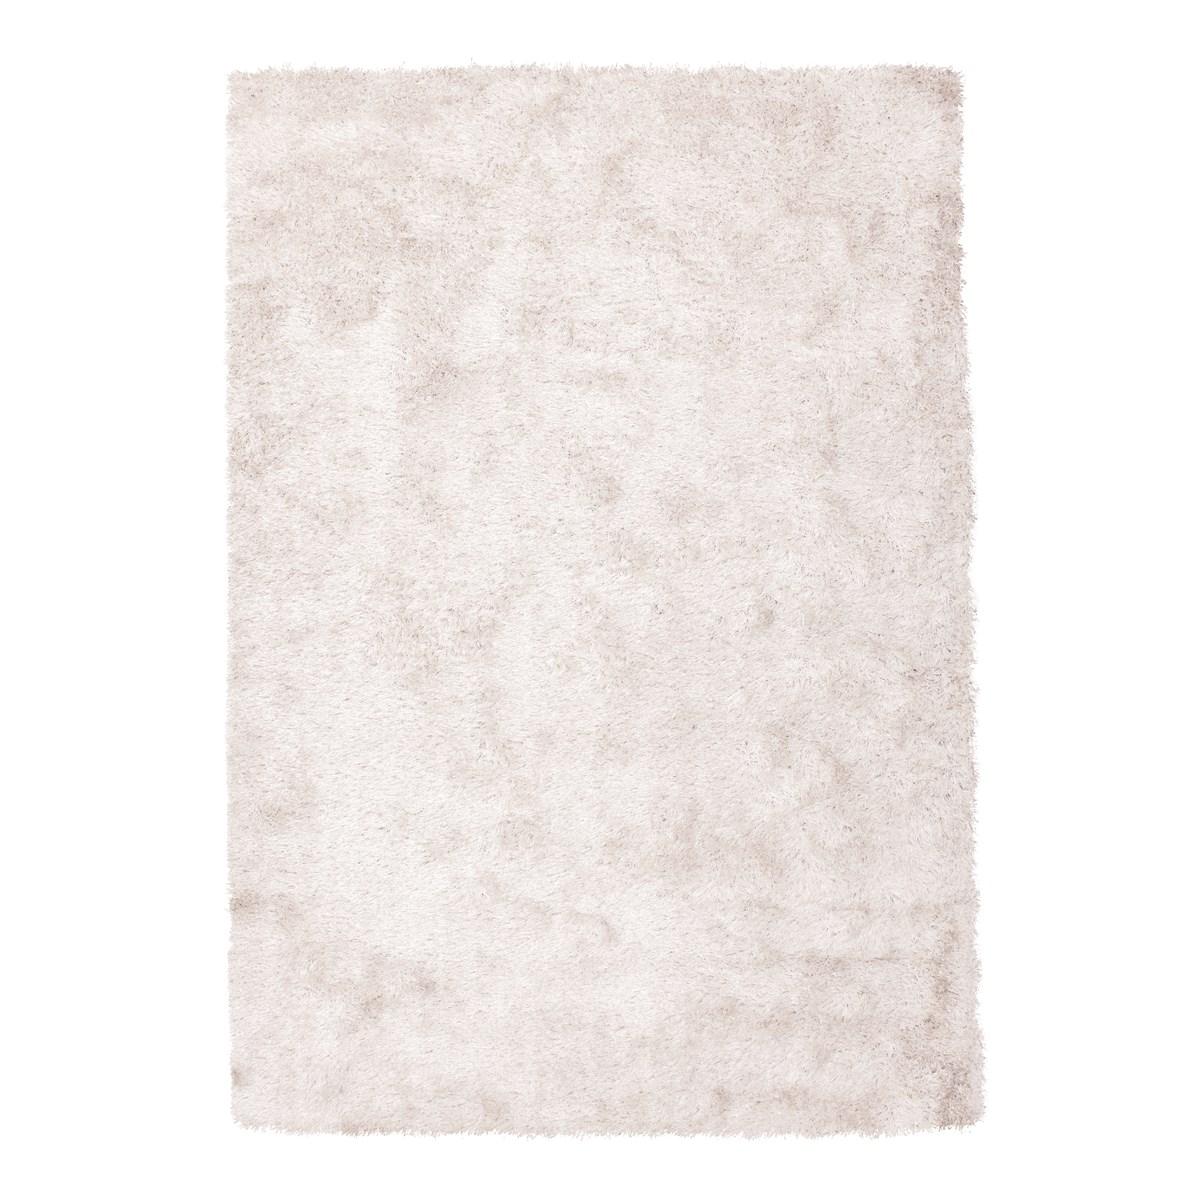 Tapis shaggy en Polyester Blanc cassé 160x160 cm